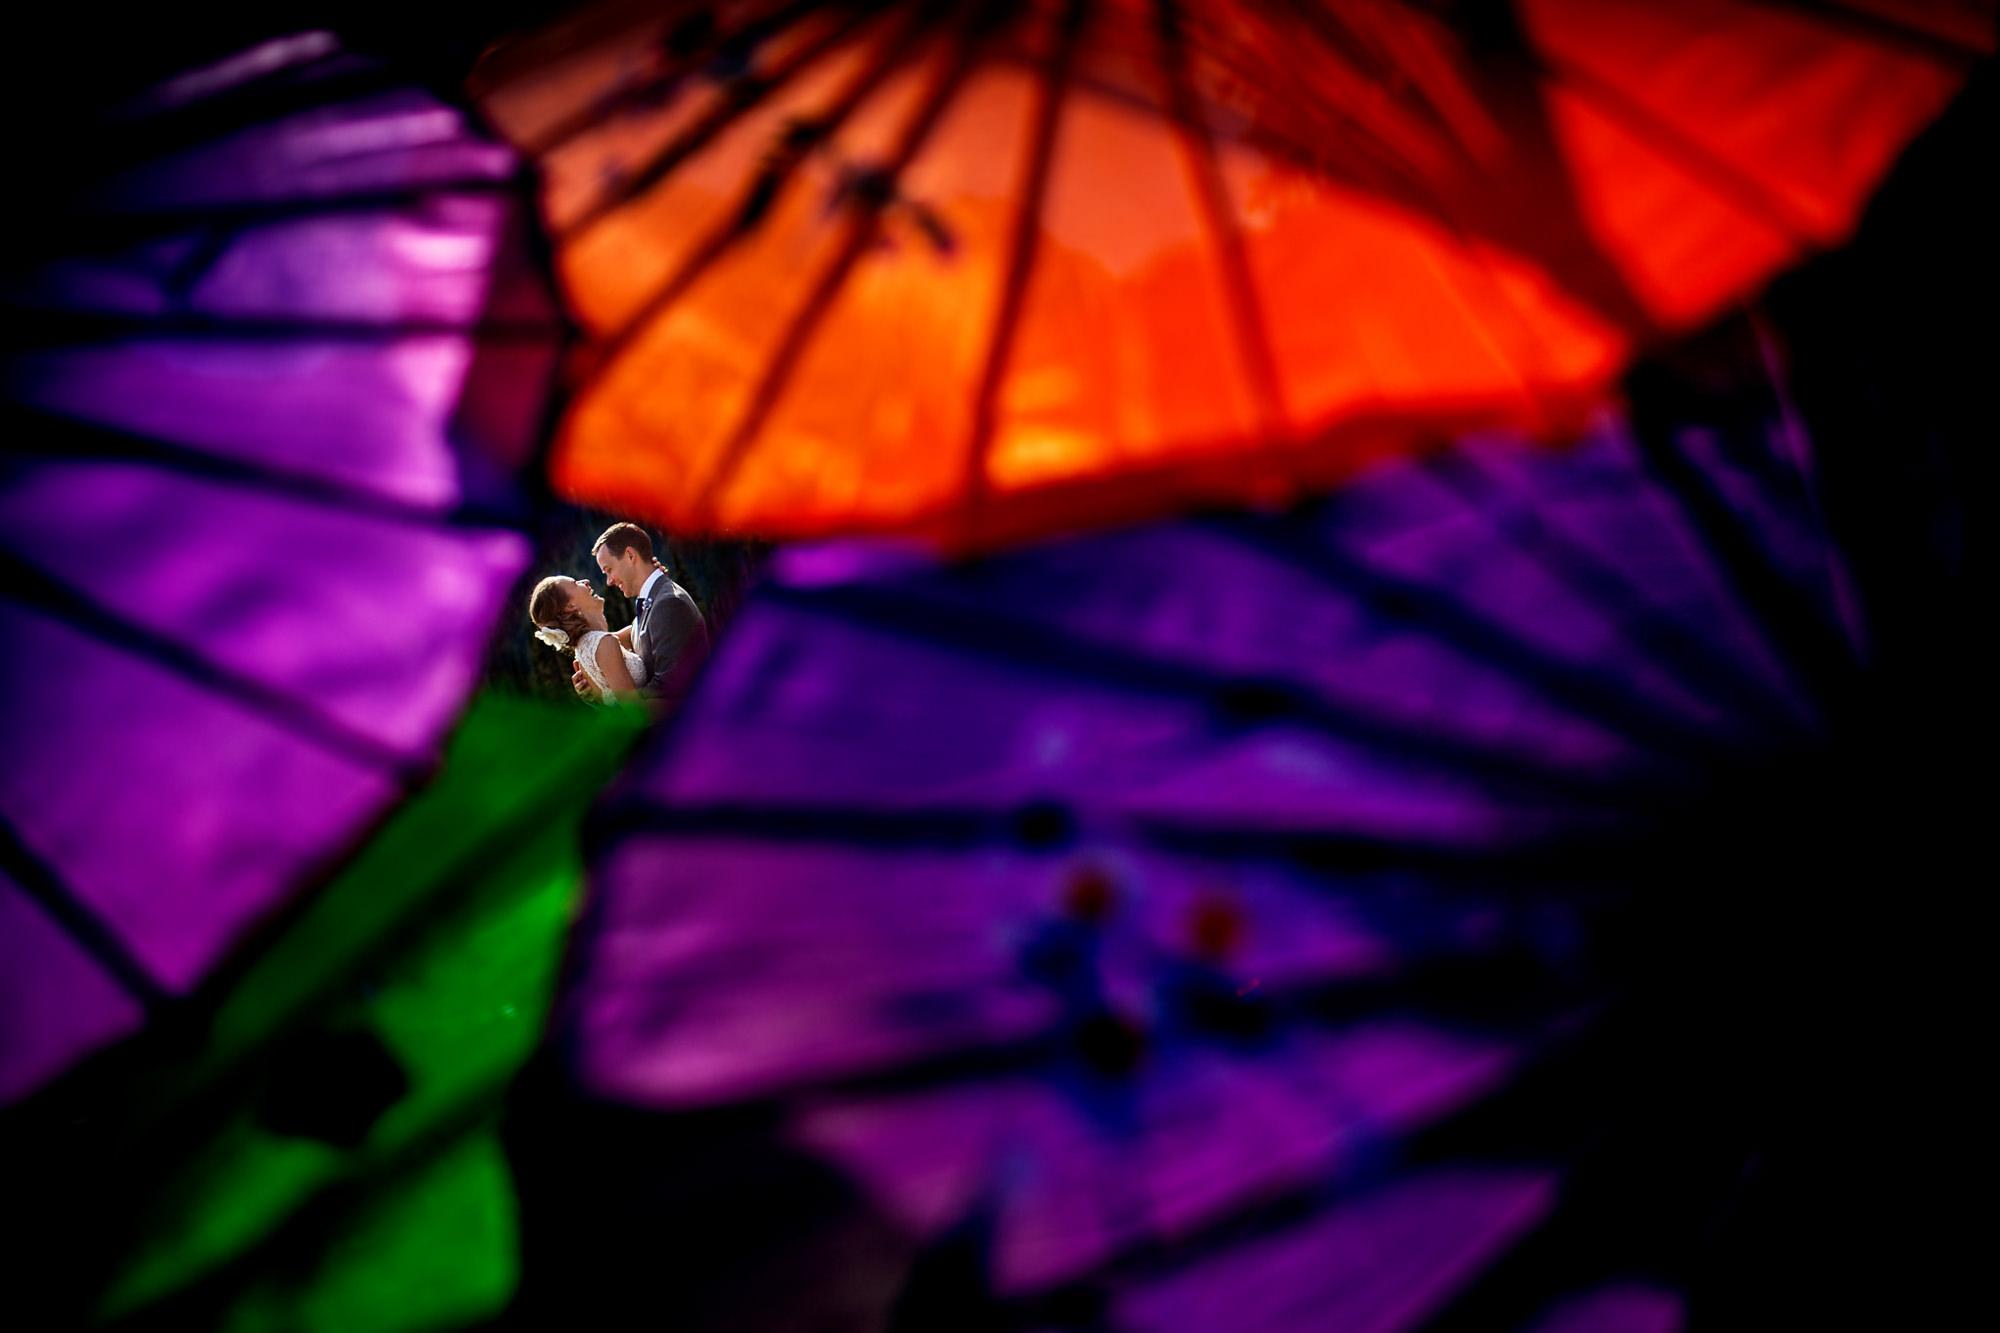 Couple through colorful umbrellas - photo by Two Mann Studios